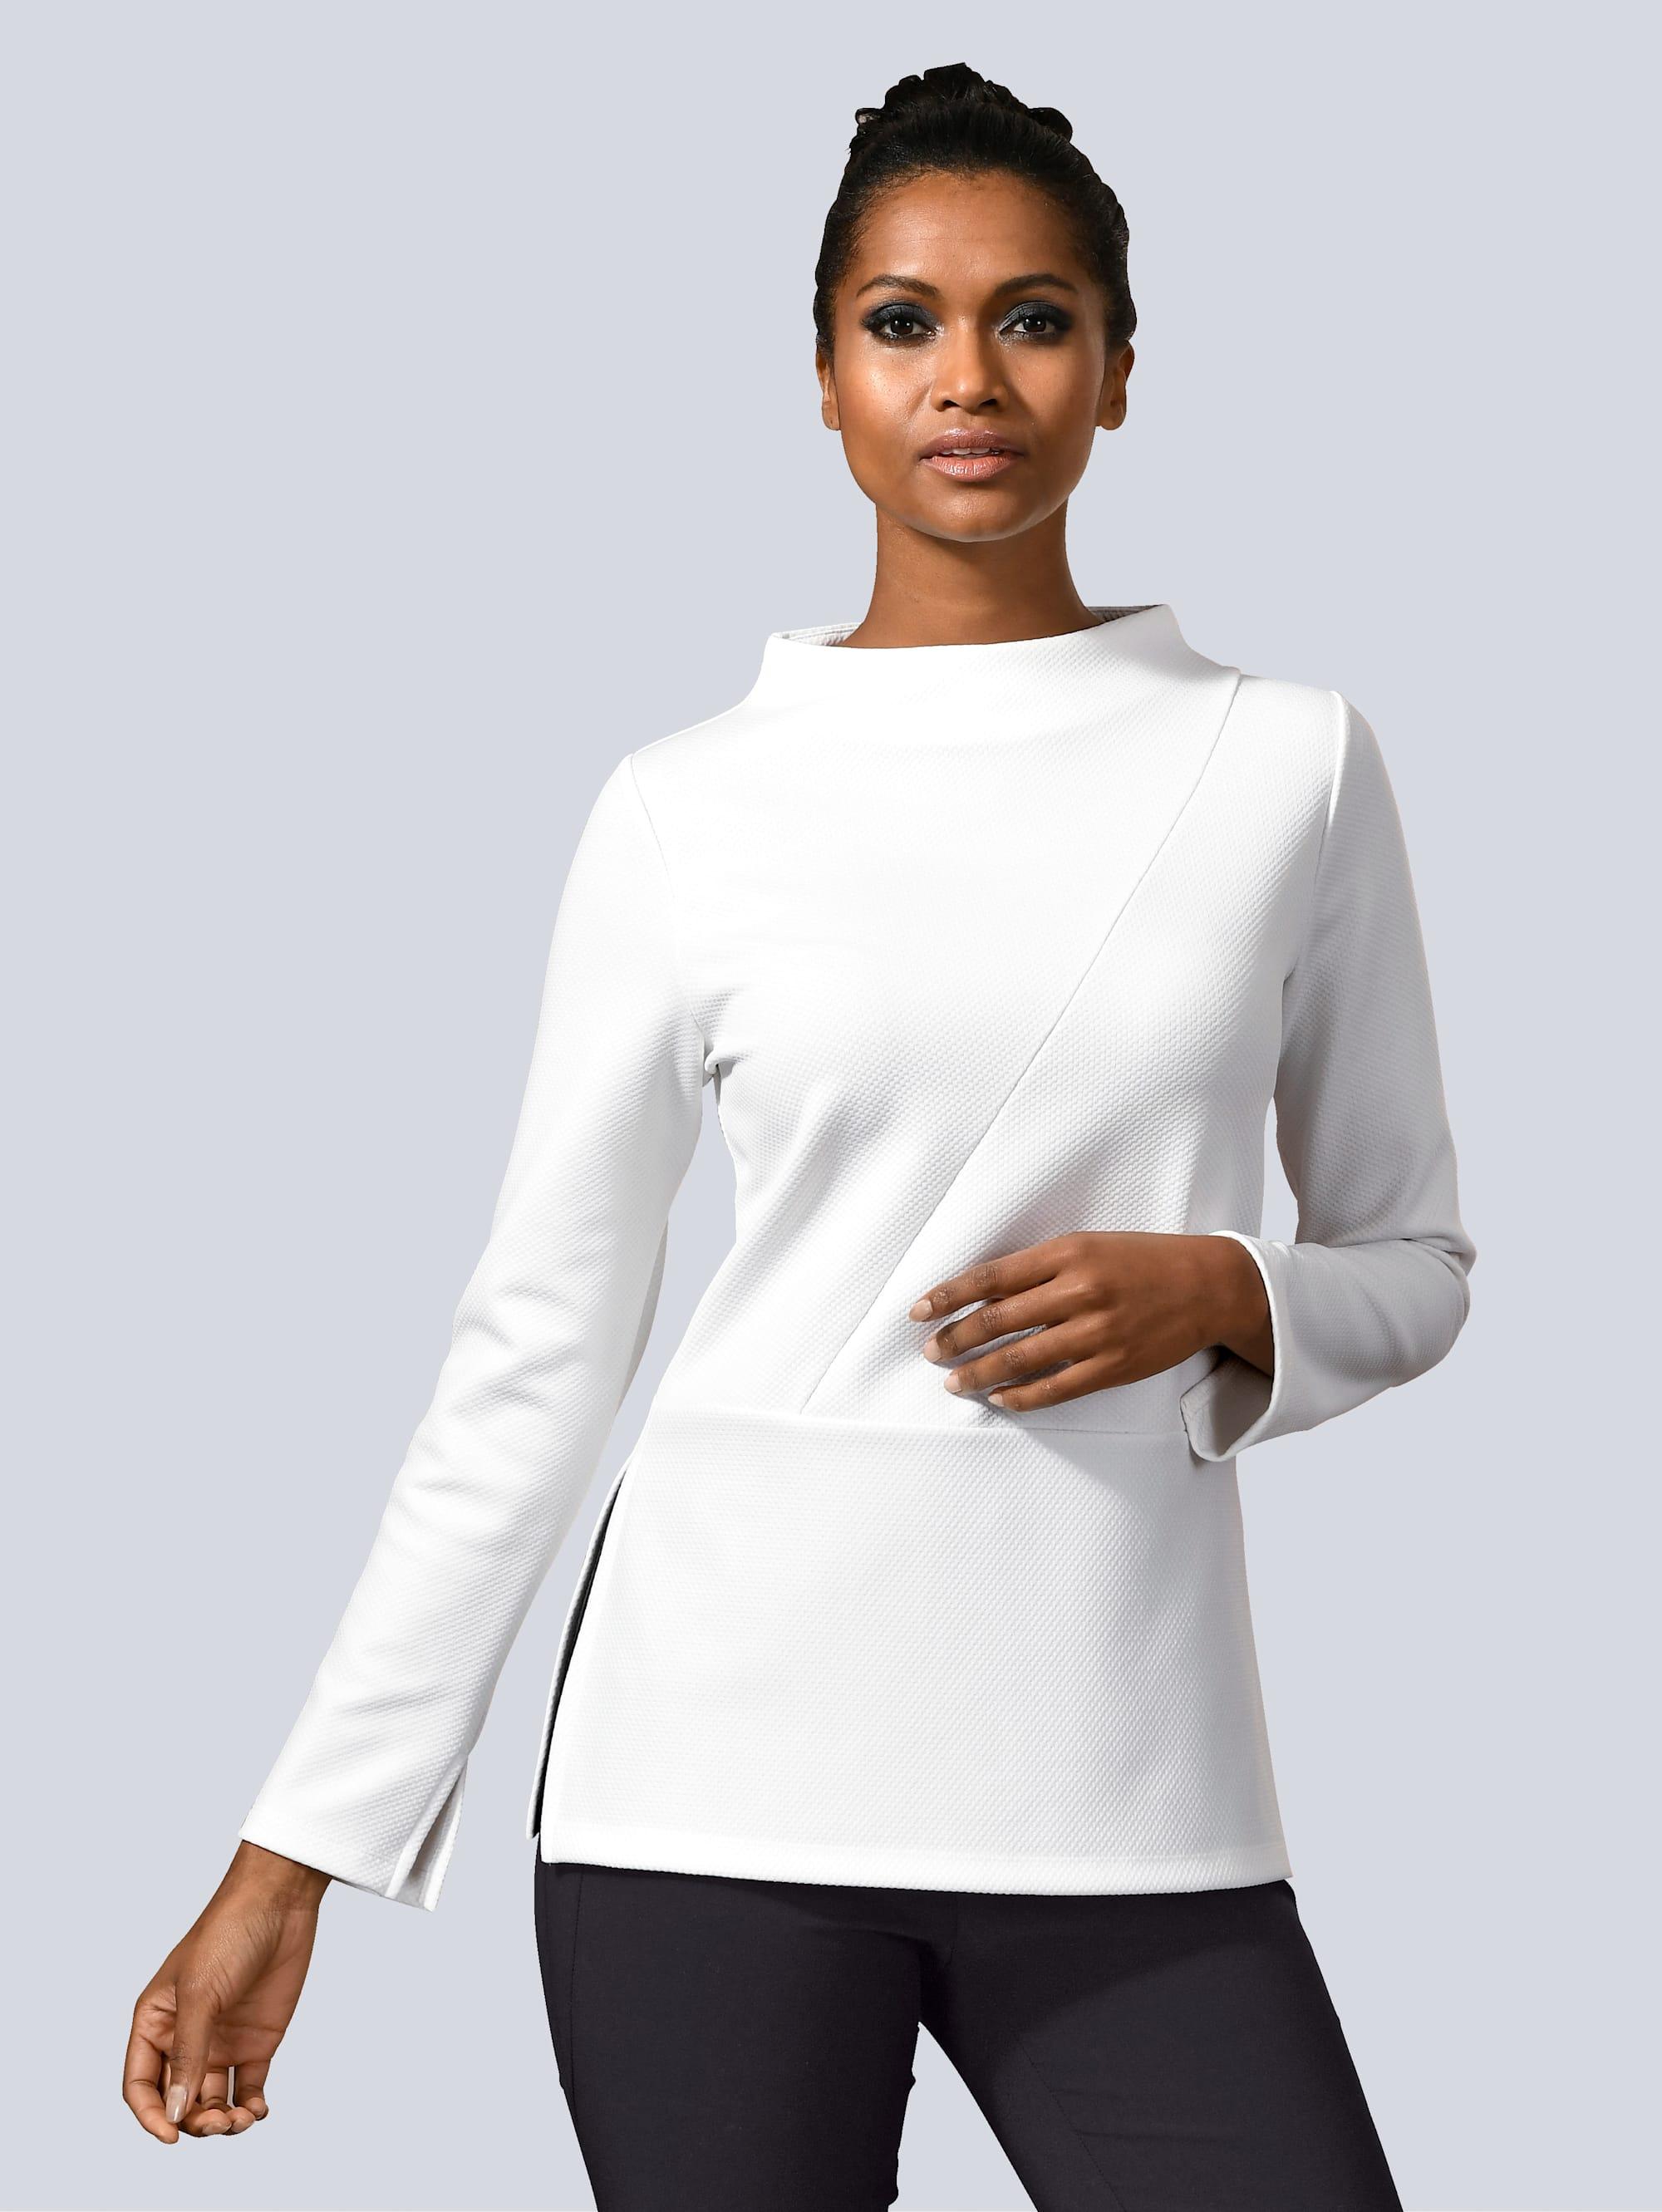 Alba Moda Shirt mit Schößchen Yzo11 CoITj